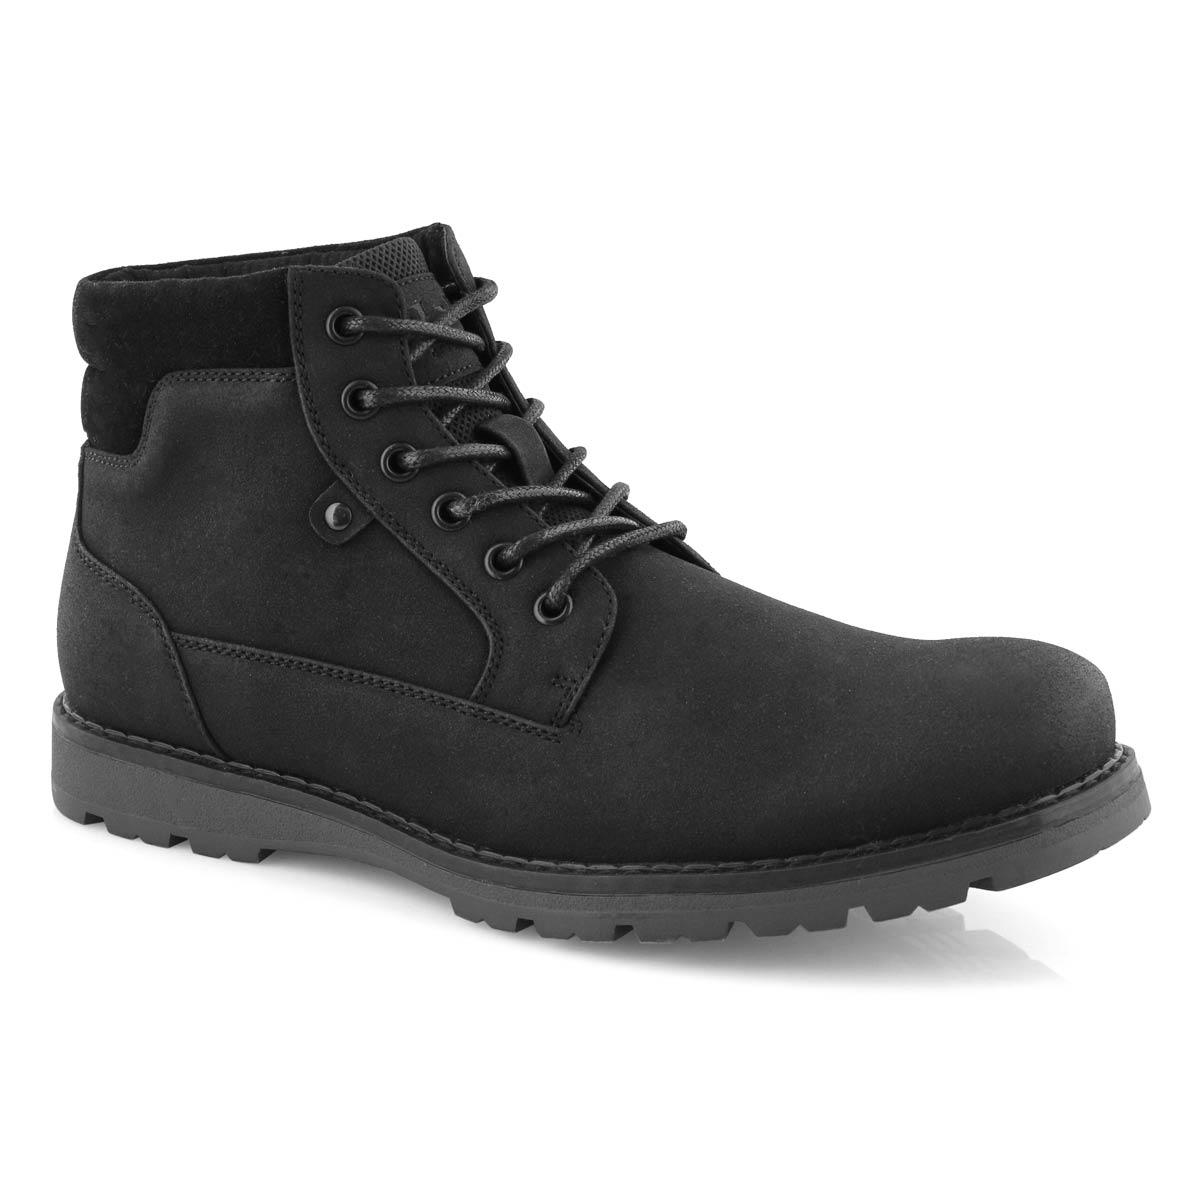 Mns Hallway 2 blk/blk lace up ankle boot